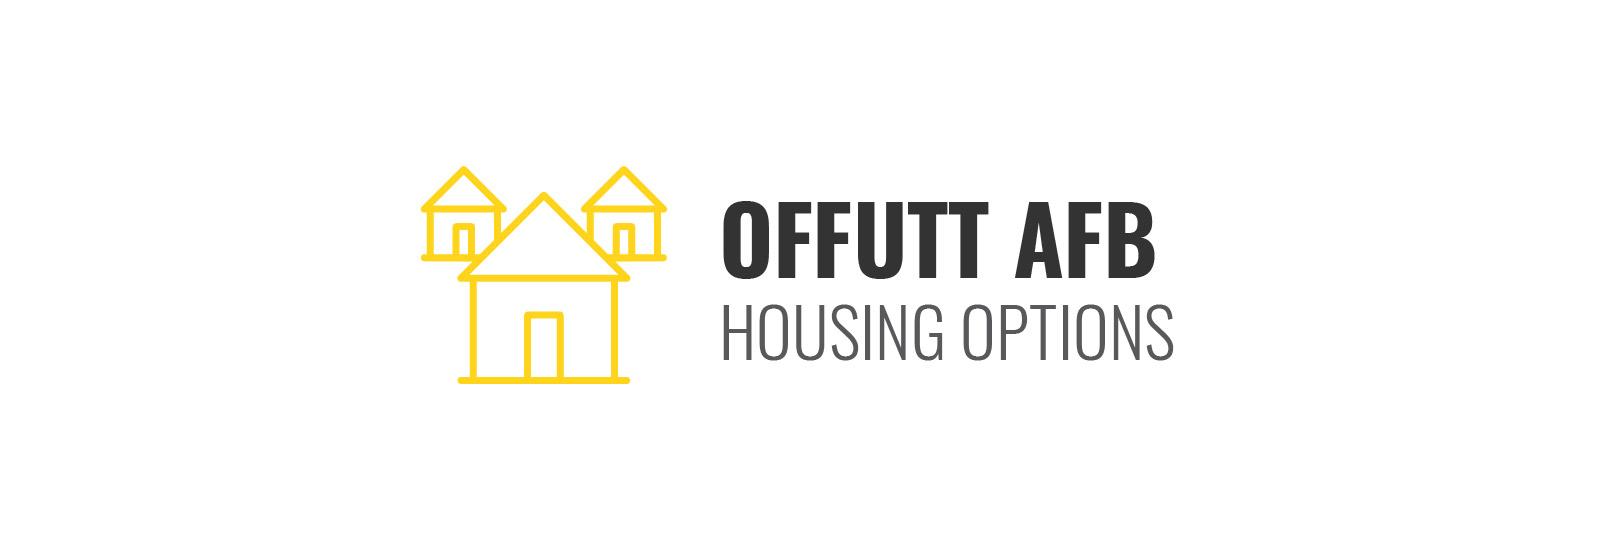 Offutt AFB Housing Options